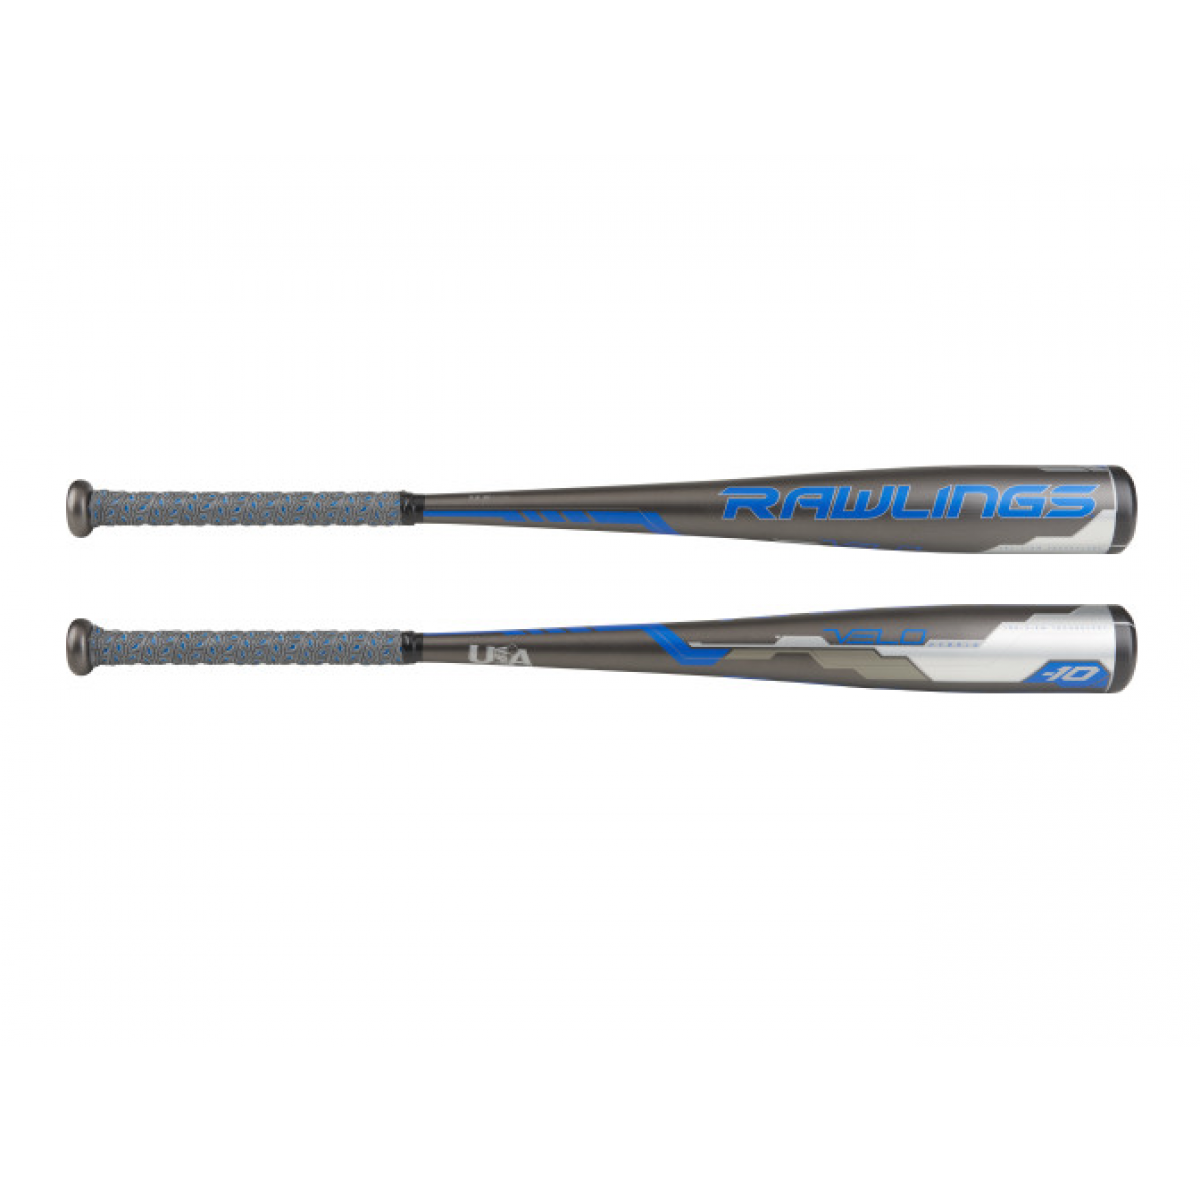 2018 Rawlings Velo 2 5/8″ -10 US8V10 Hybrid Hybrid US8V10 USA Baseball Bat 32/22, niw,RECEIPT ffe89c